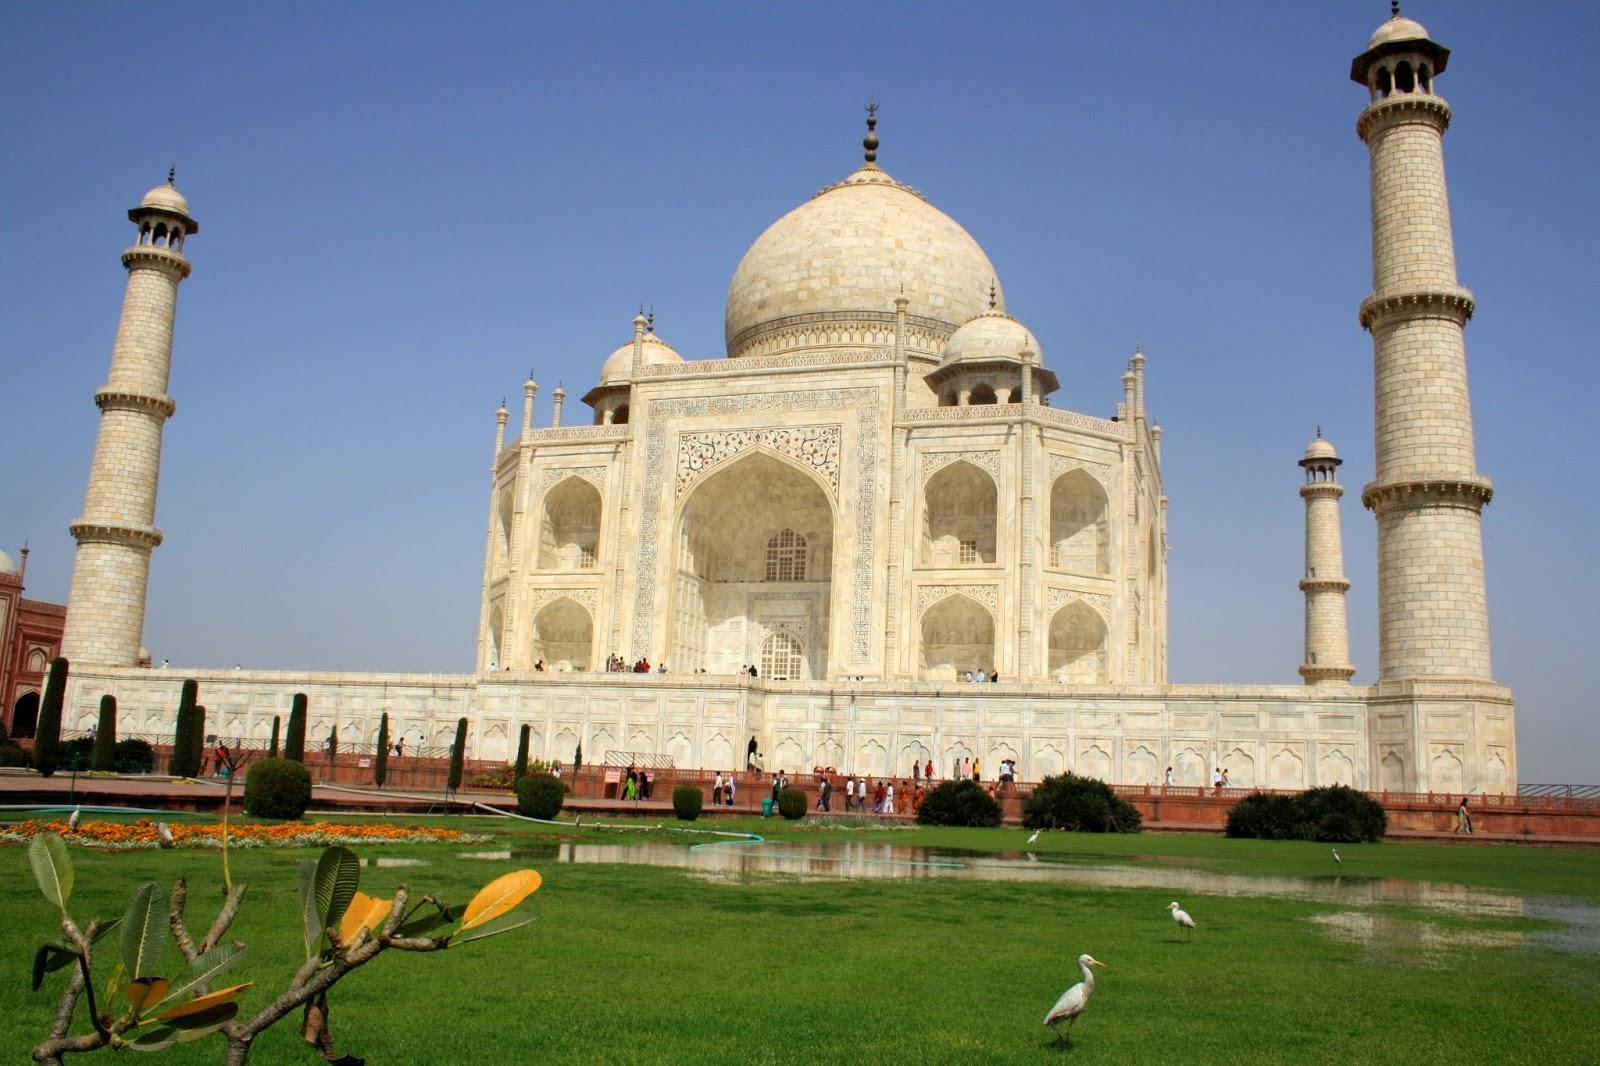 India 7wonder Of The World Taj Mahal Full Hd Wallpapers 1080p Free